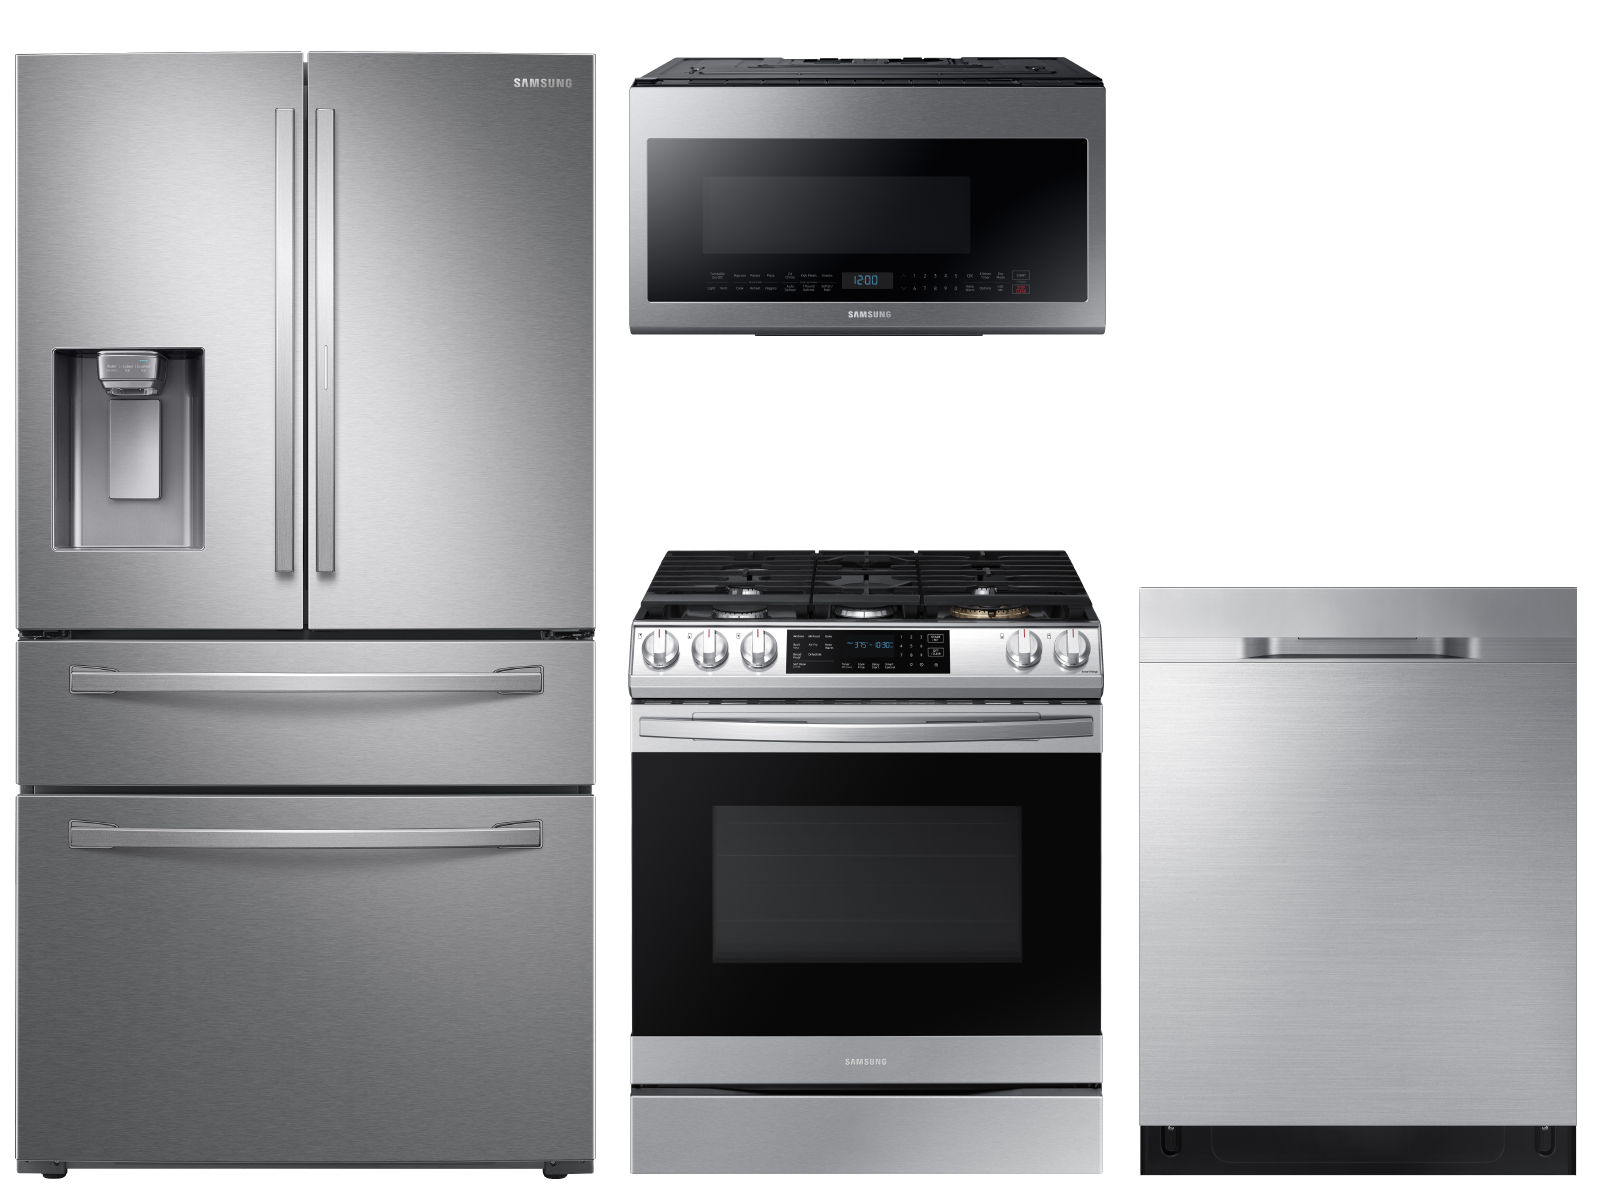 Food Showcase 4-Door Refrigerator + Slide-in Gas Range with Air Fry +  StormWash™ Dishwasher + Microwave in Stainless Steel